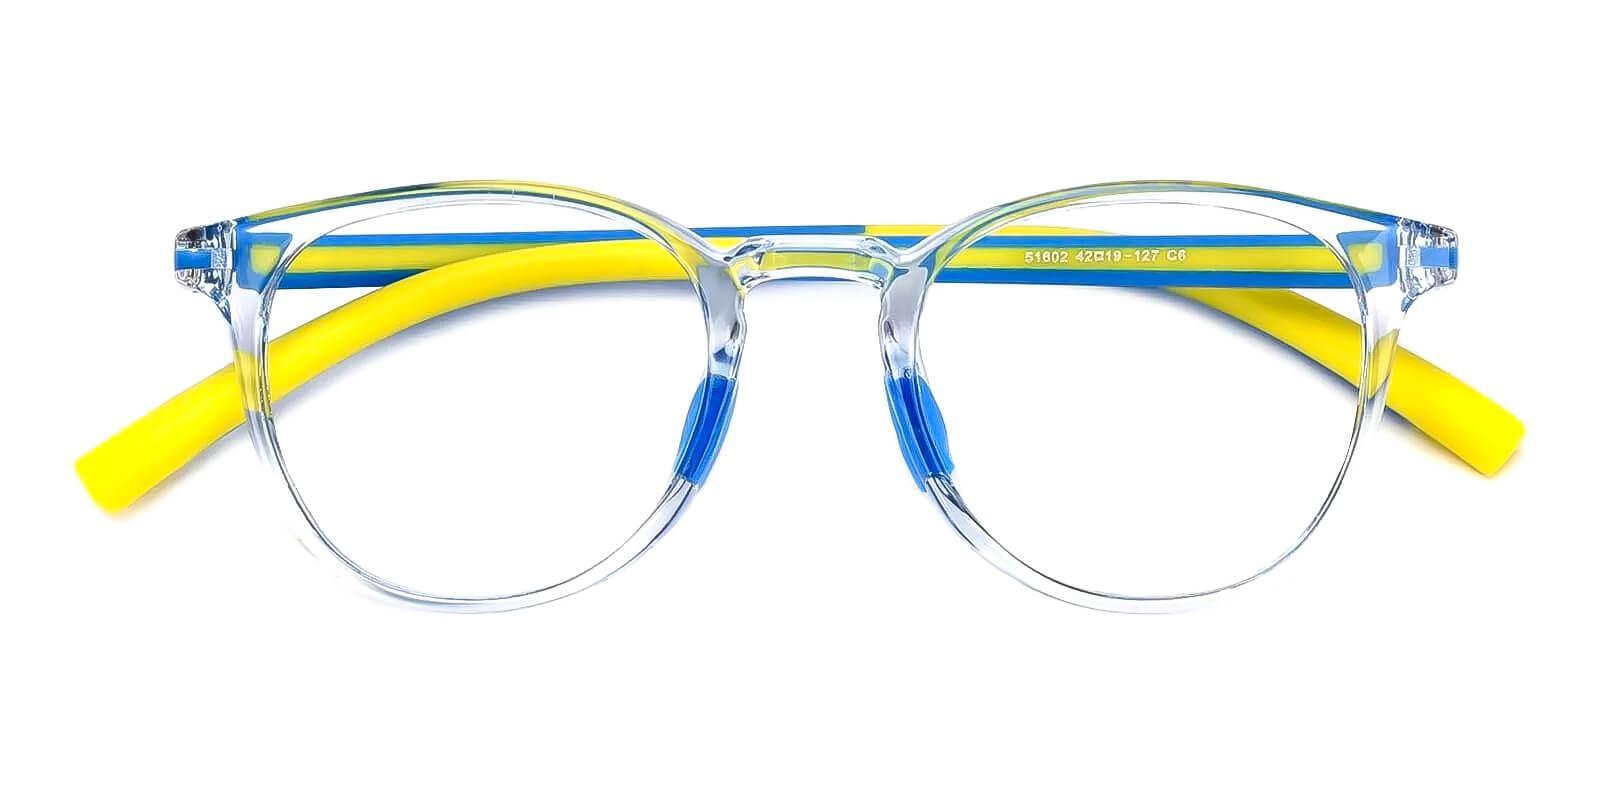 Kids-Experience Translucent Plastic Eyeglasses , Fashion , UniversalBridgeFit Frames from ABBE Glasses